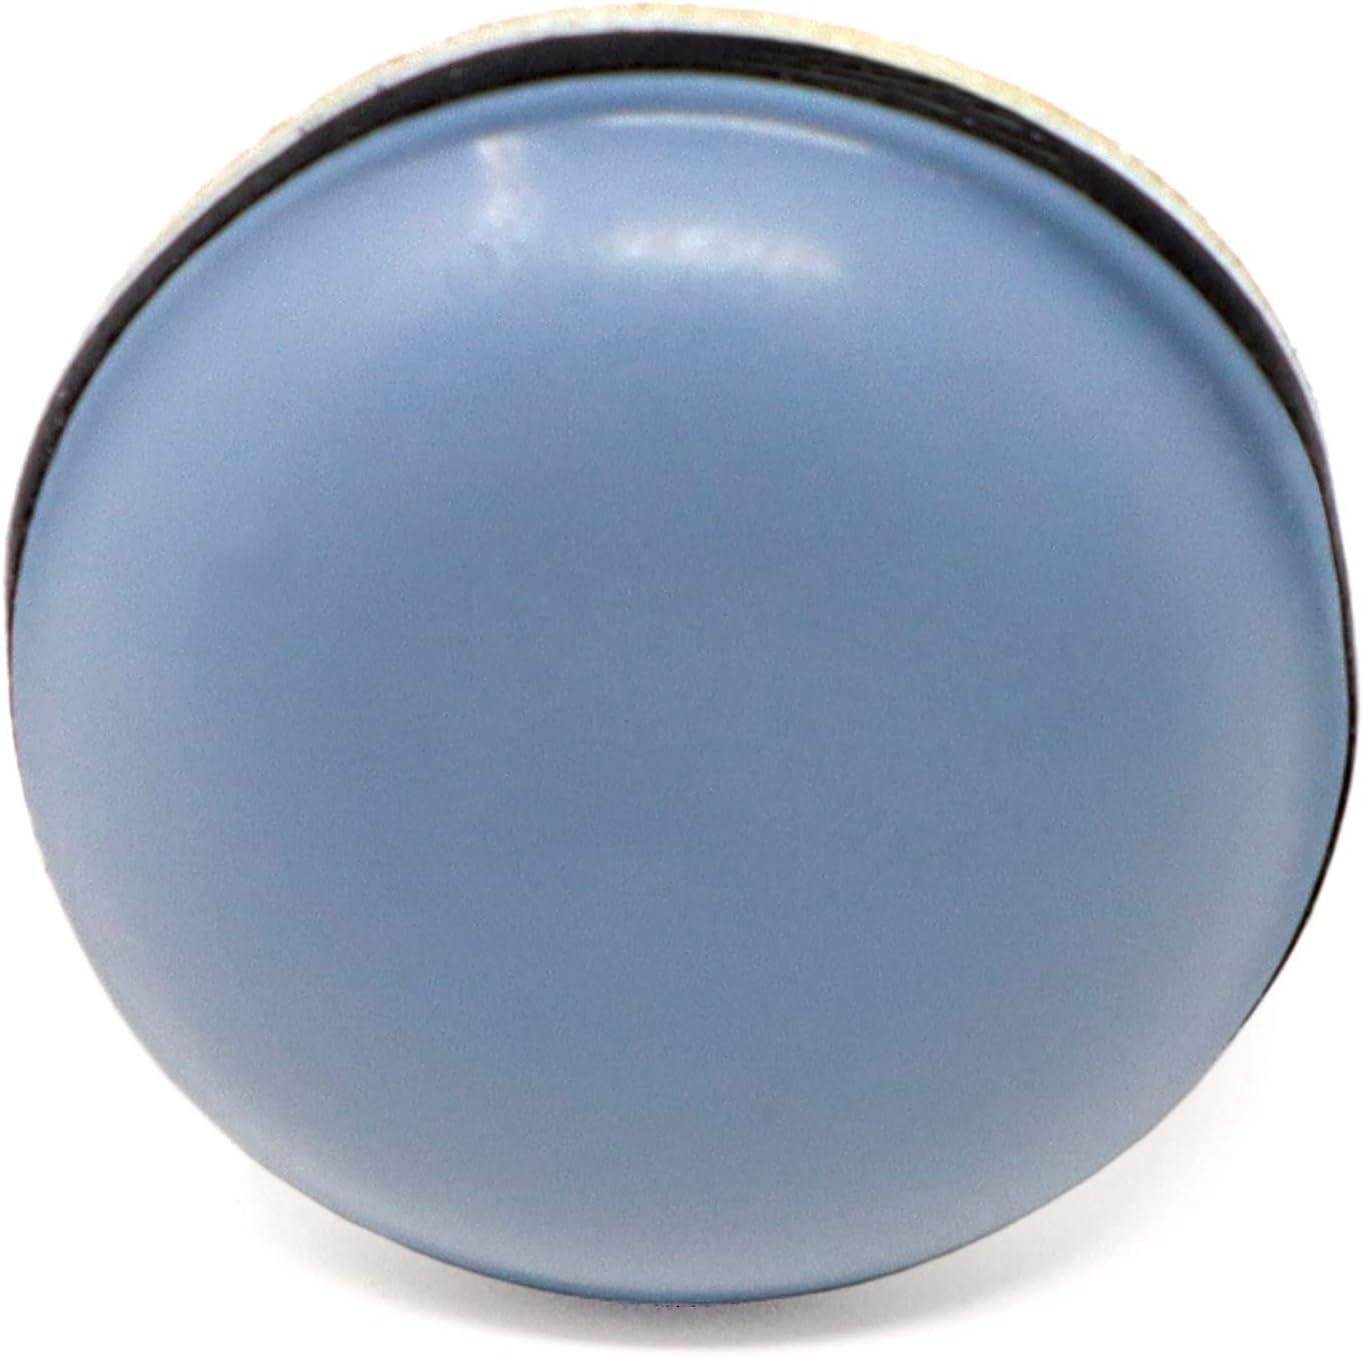 Adsamm/® // 16 x PTFE Glides /Ø 0,79 Round Premium Quality self-Adhesive Furniture Sliders by Adsamm/® | Grey-Blue /Ø 20 mm